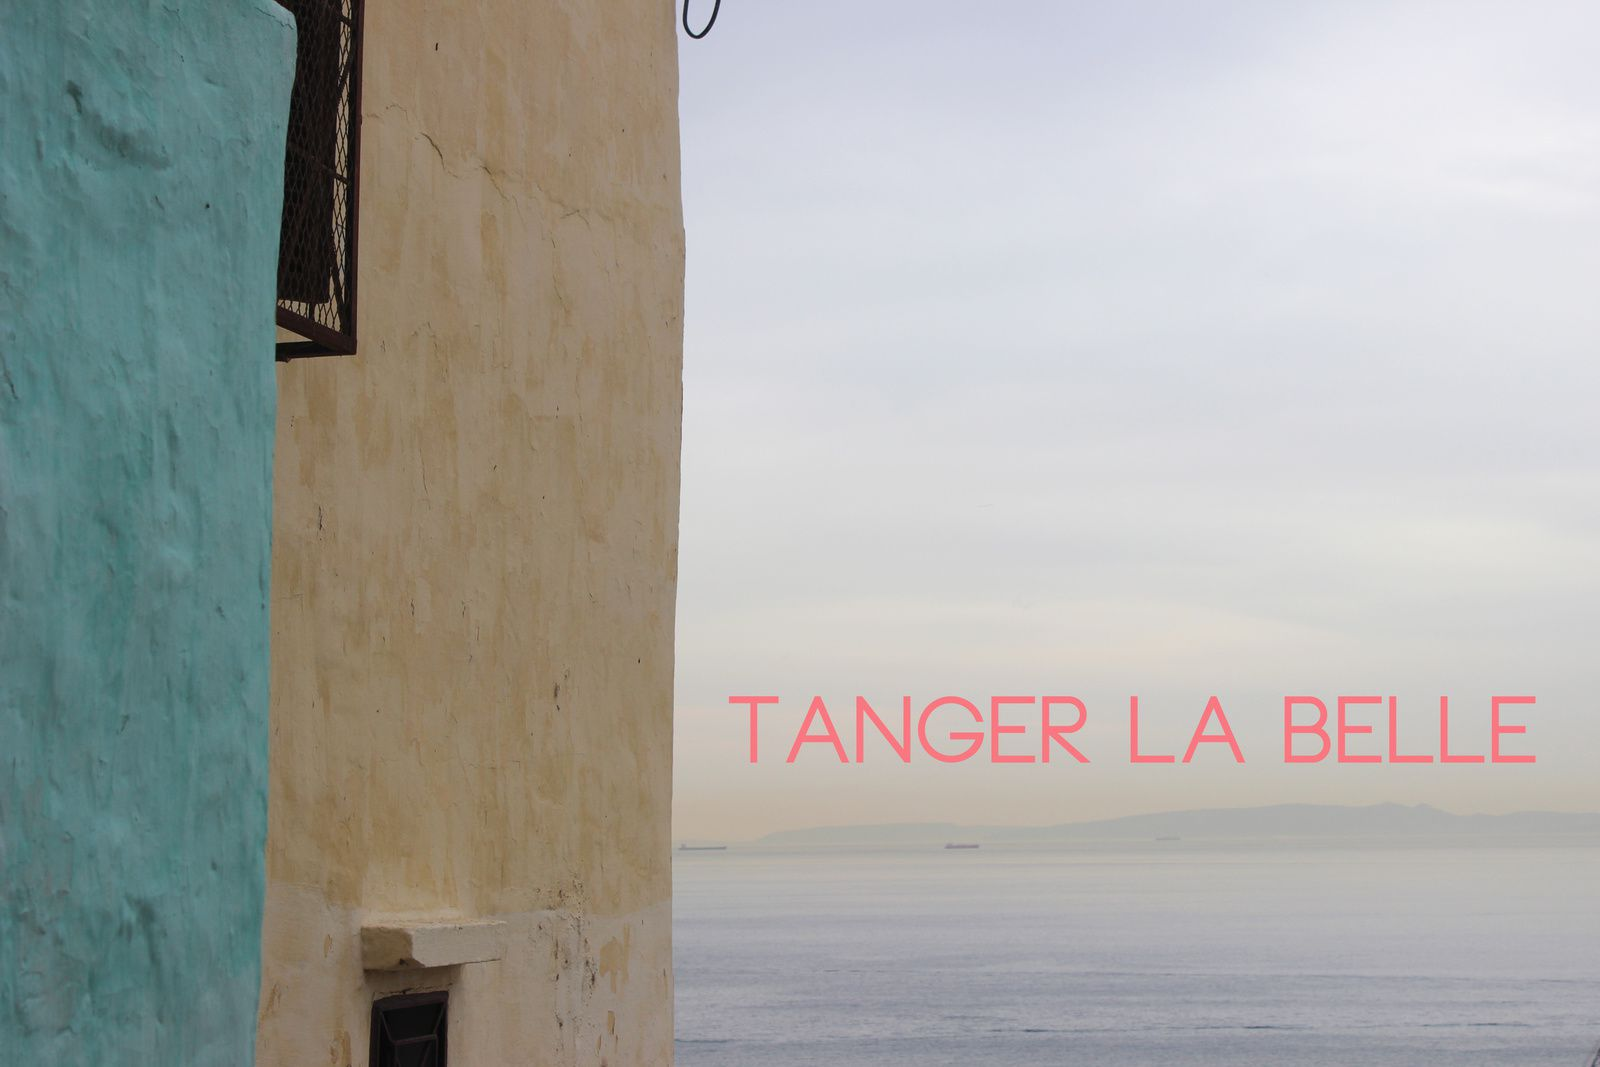 Tanger la belle